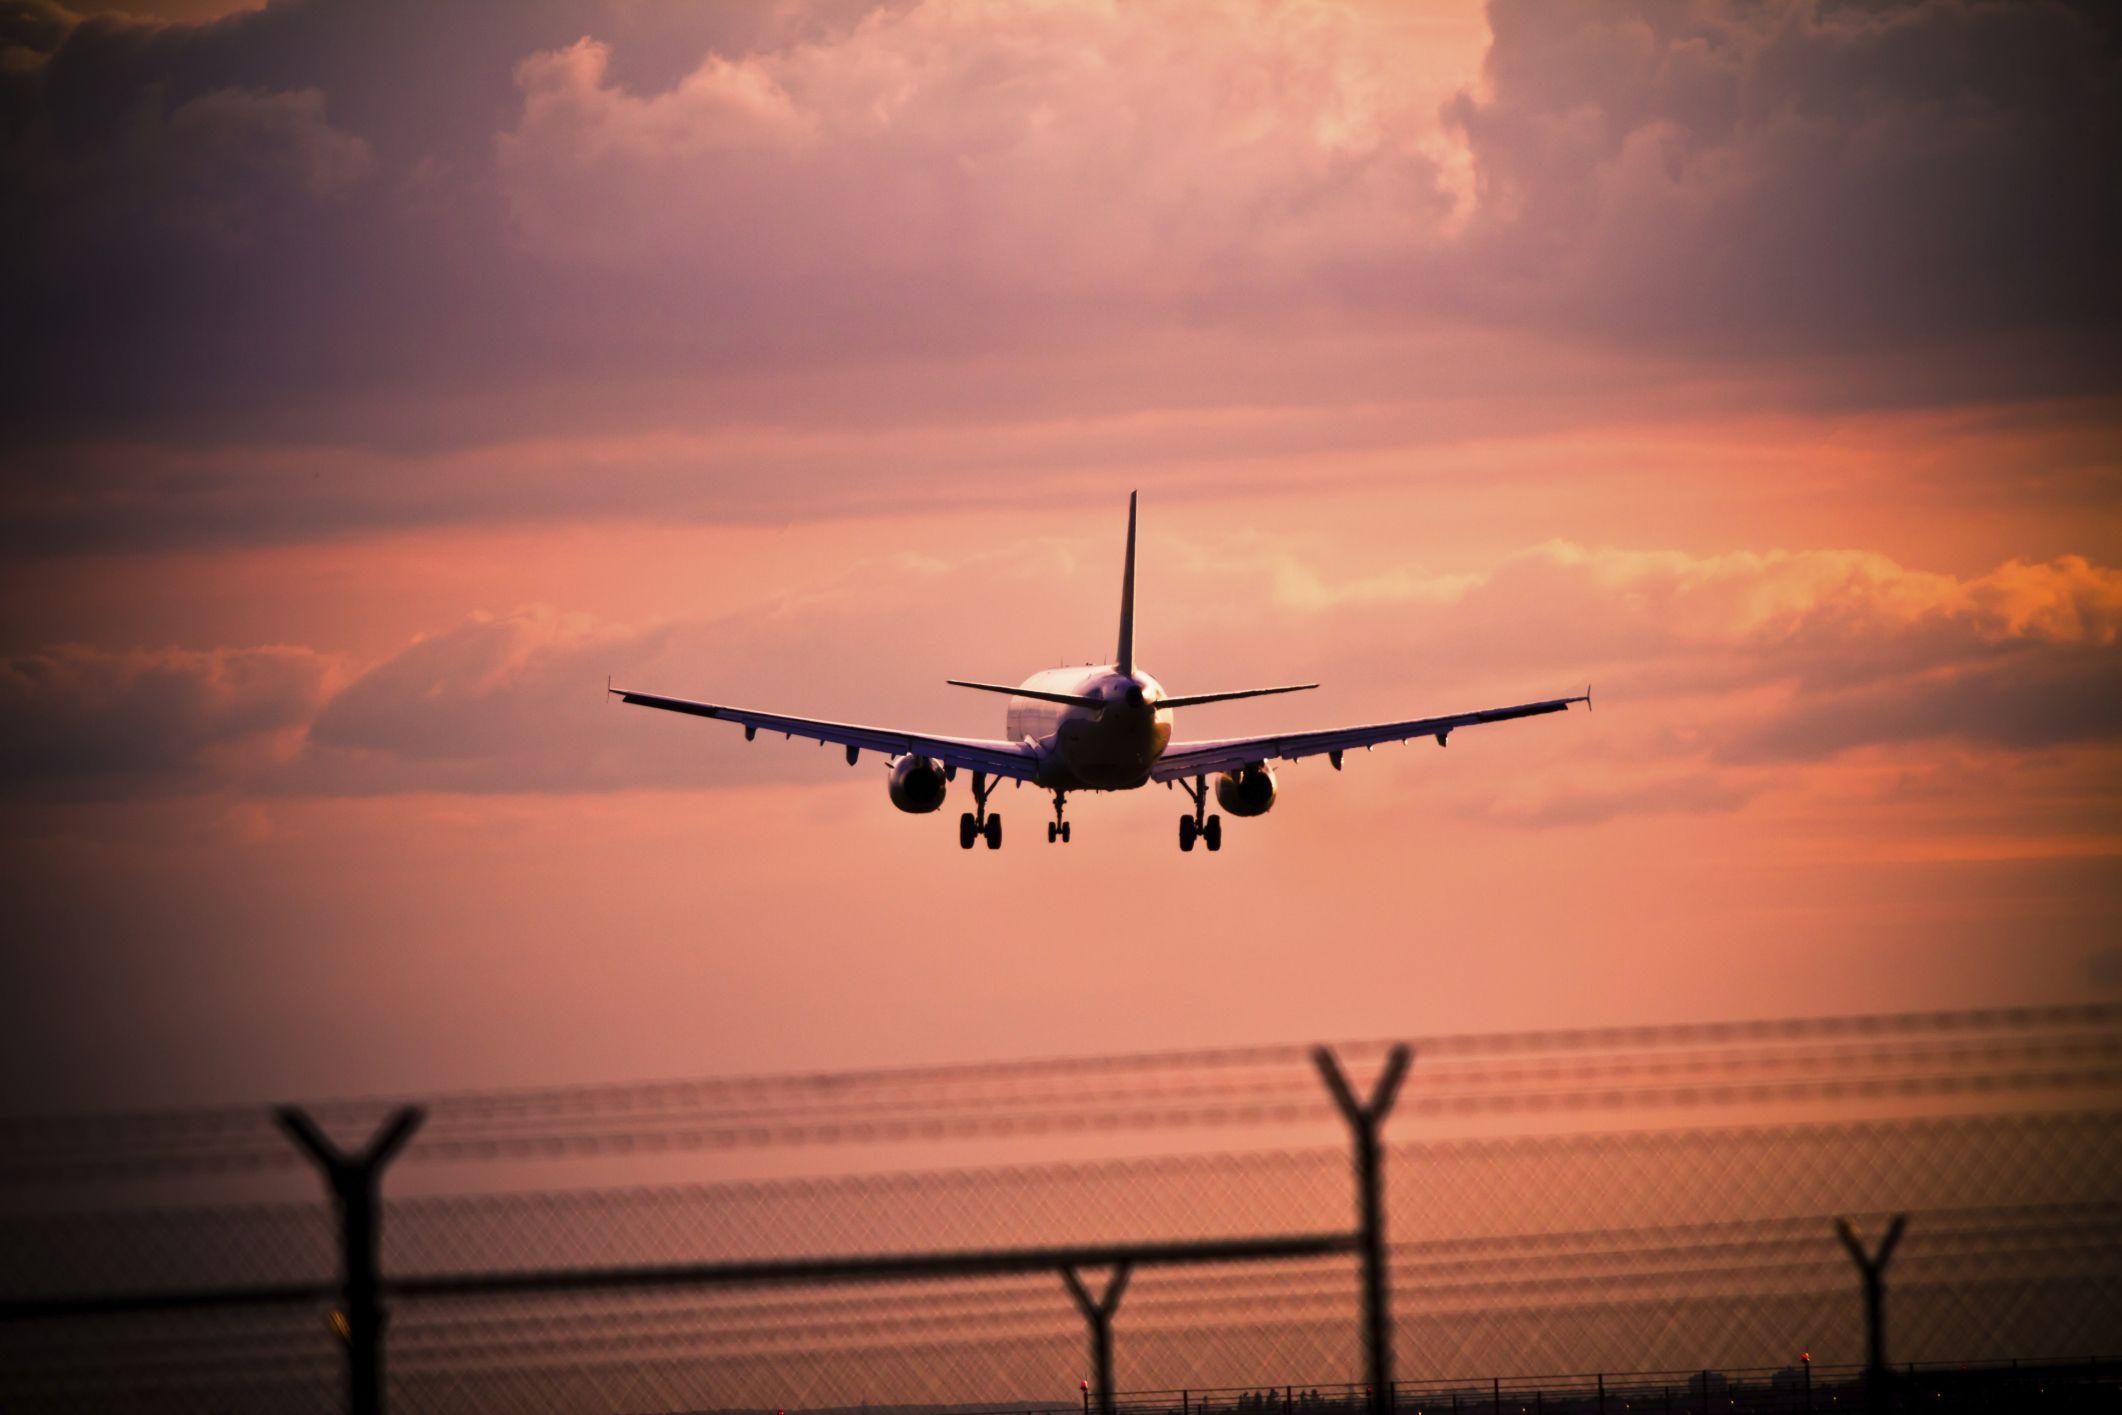 A plane lands at Nuremberg Airport